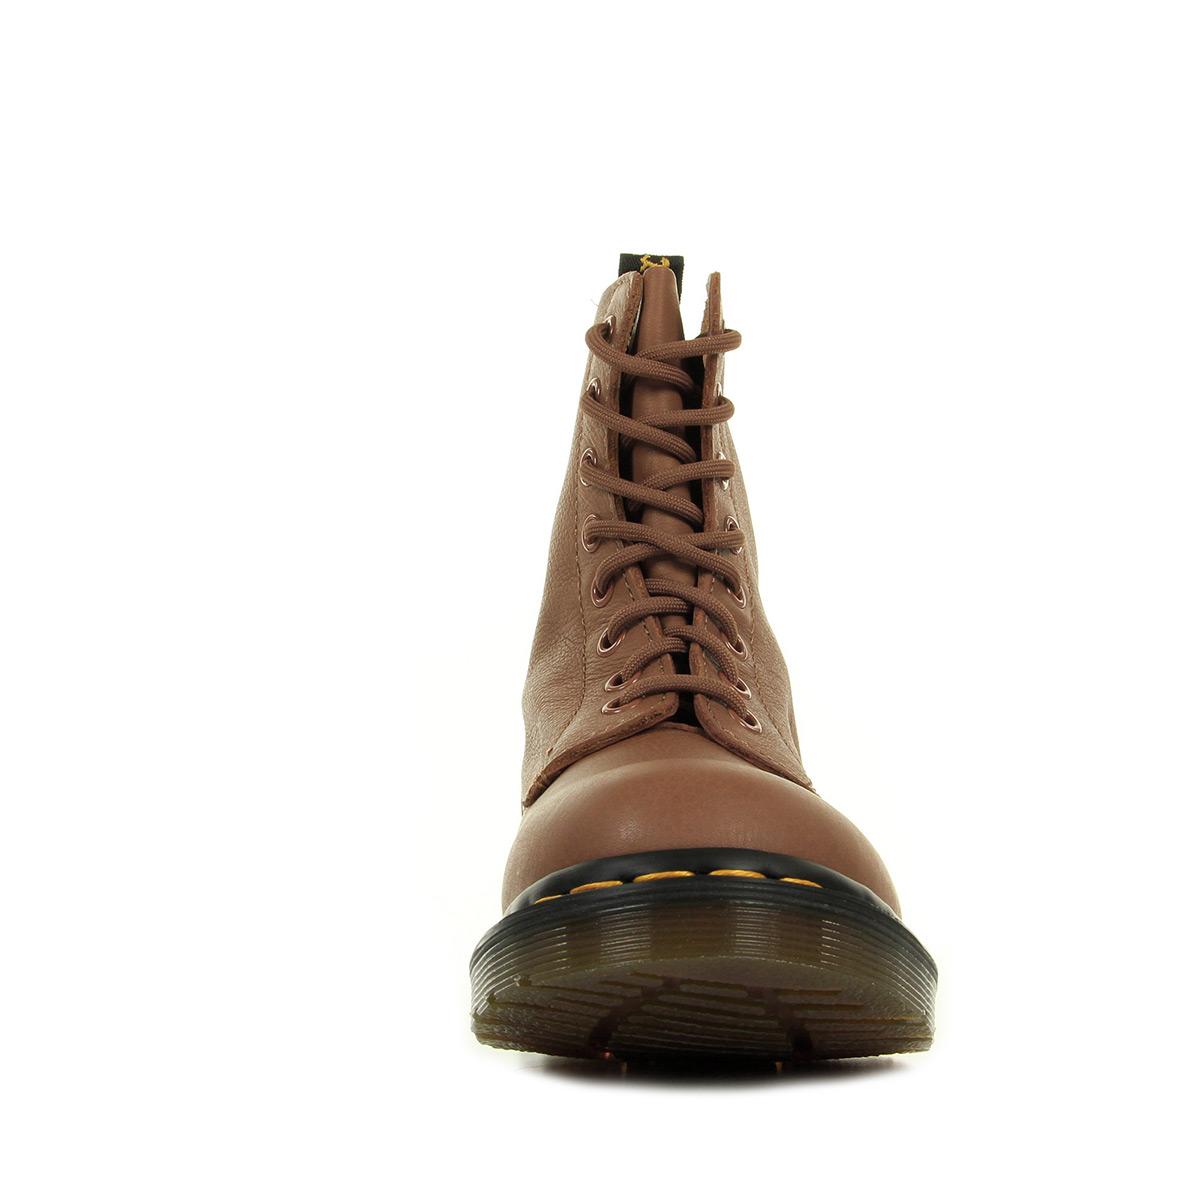 Boots 21419220 Martens Pascal Femme Tan Dr IWwgvcqT1I